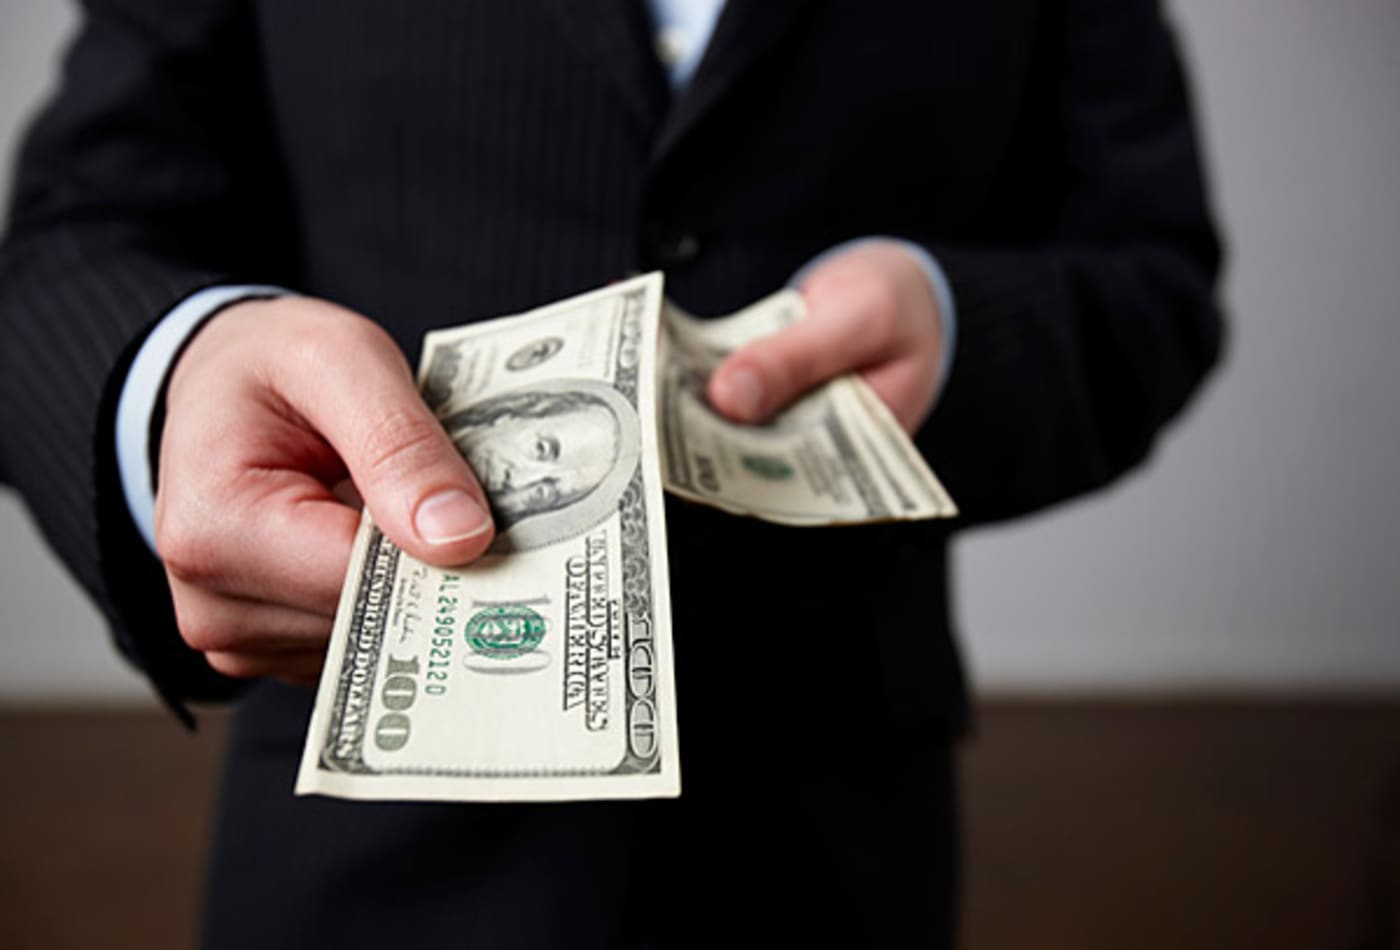 CNBC-last-minute-gifts-make-debt.jpg